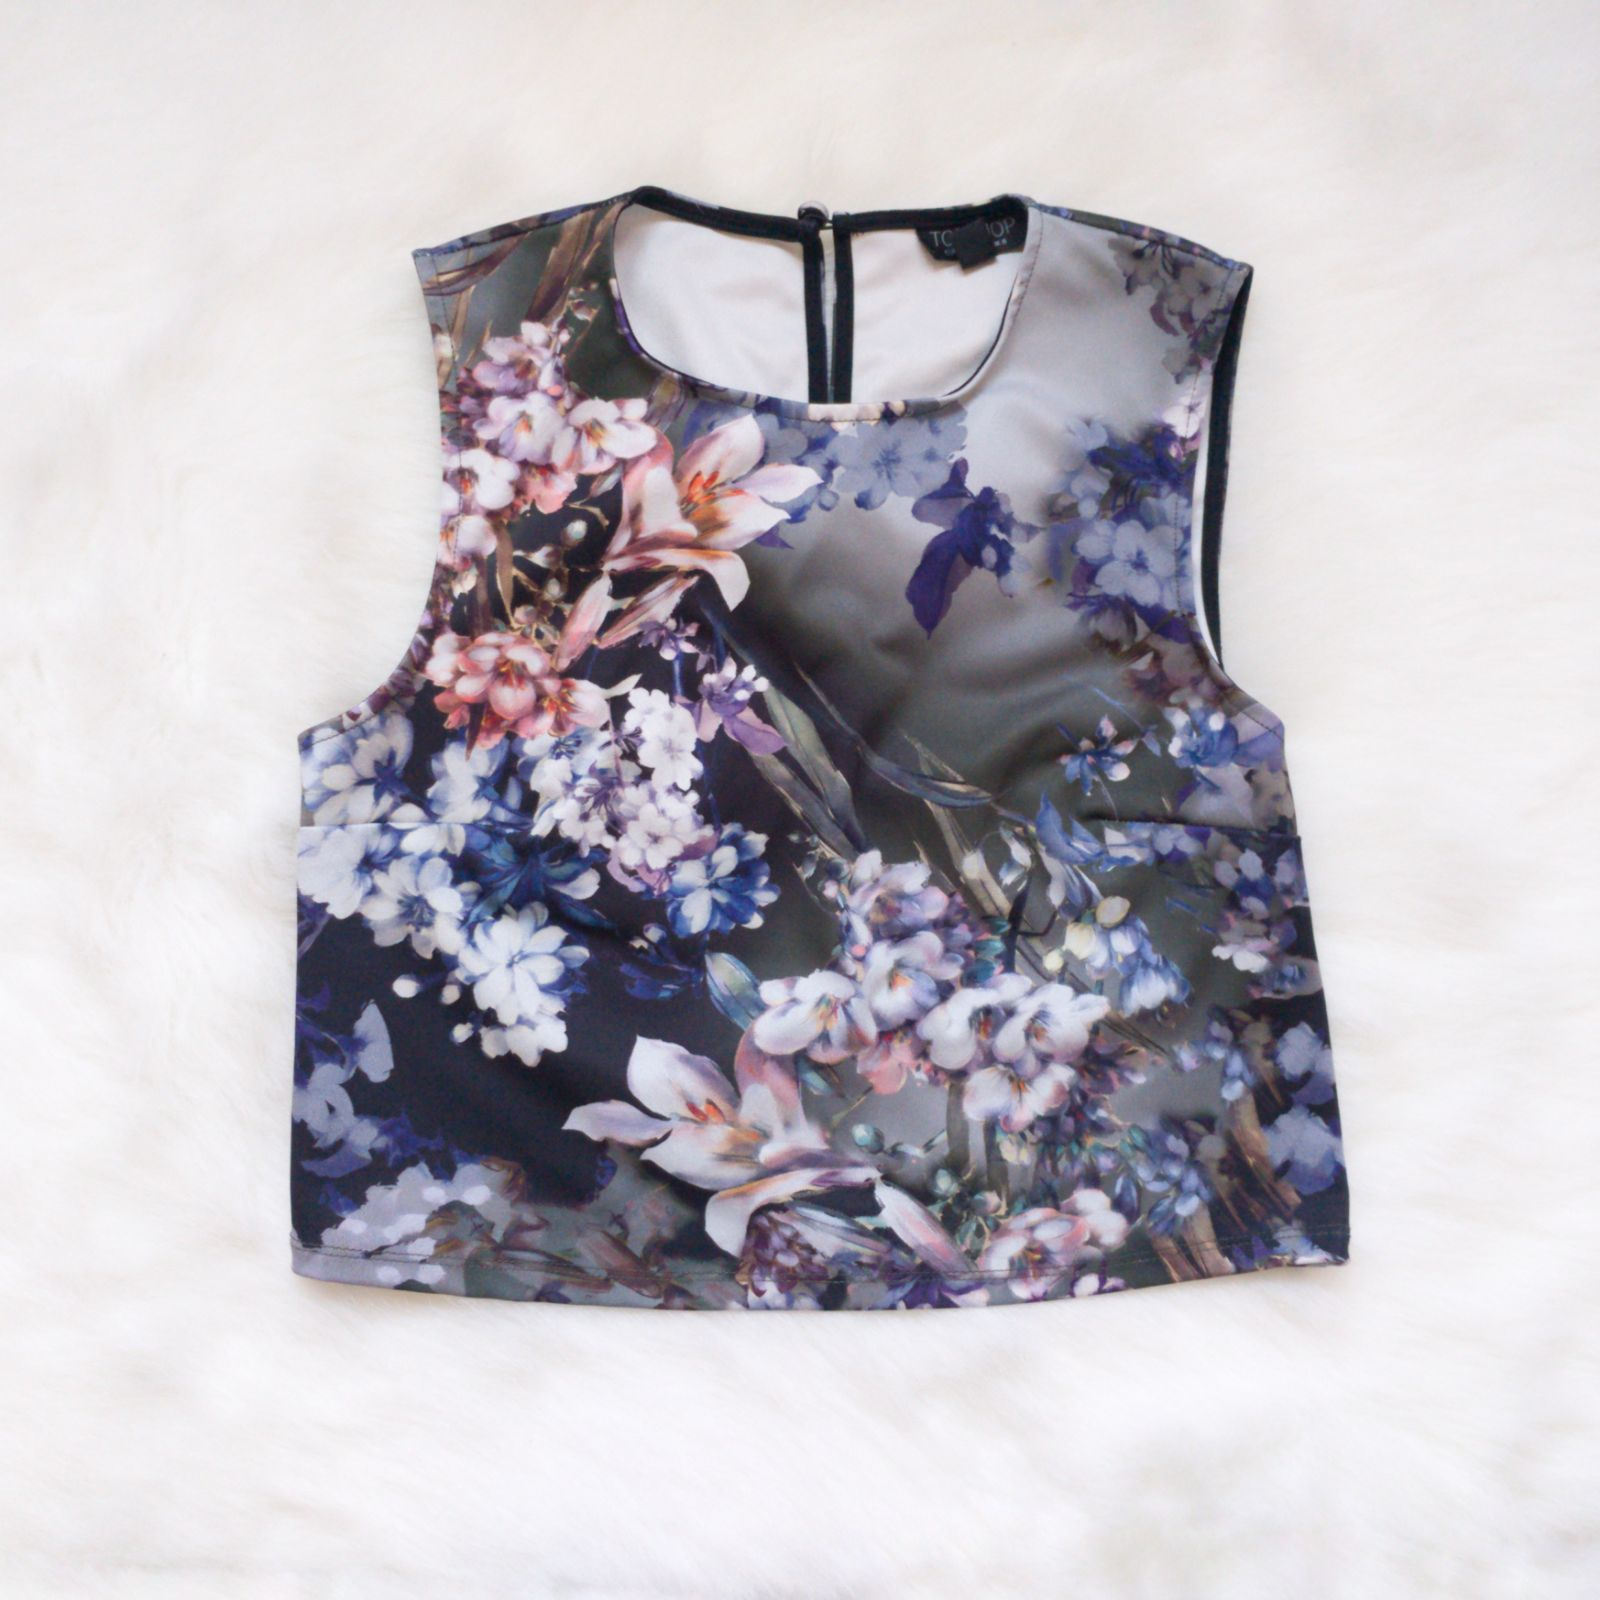 Topshop Floral Sleeveless Crop Top Sz 4